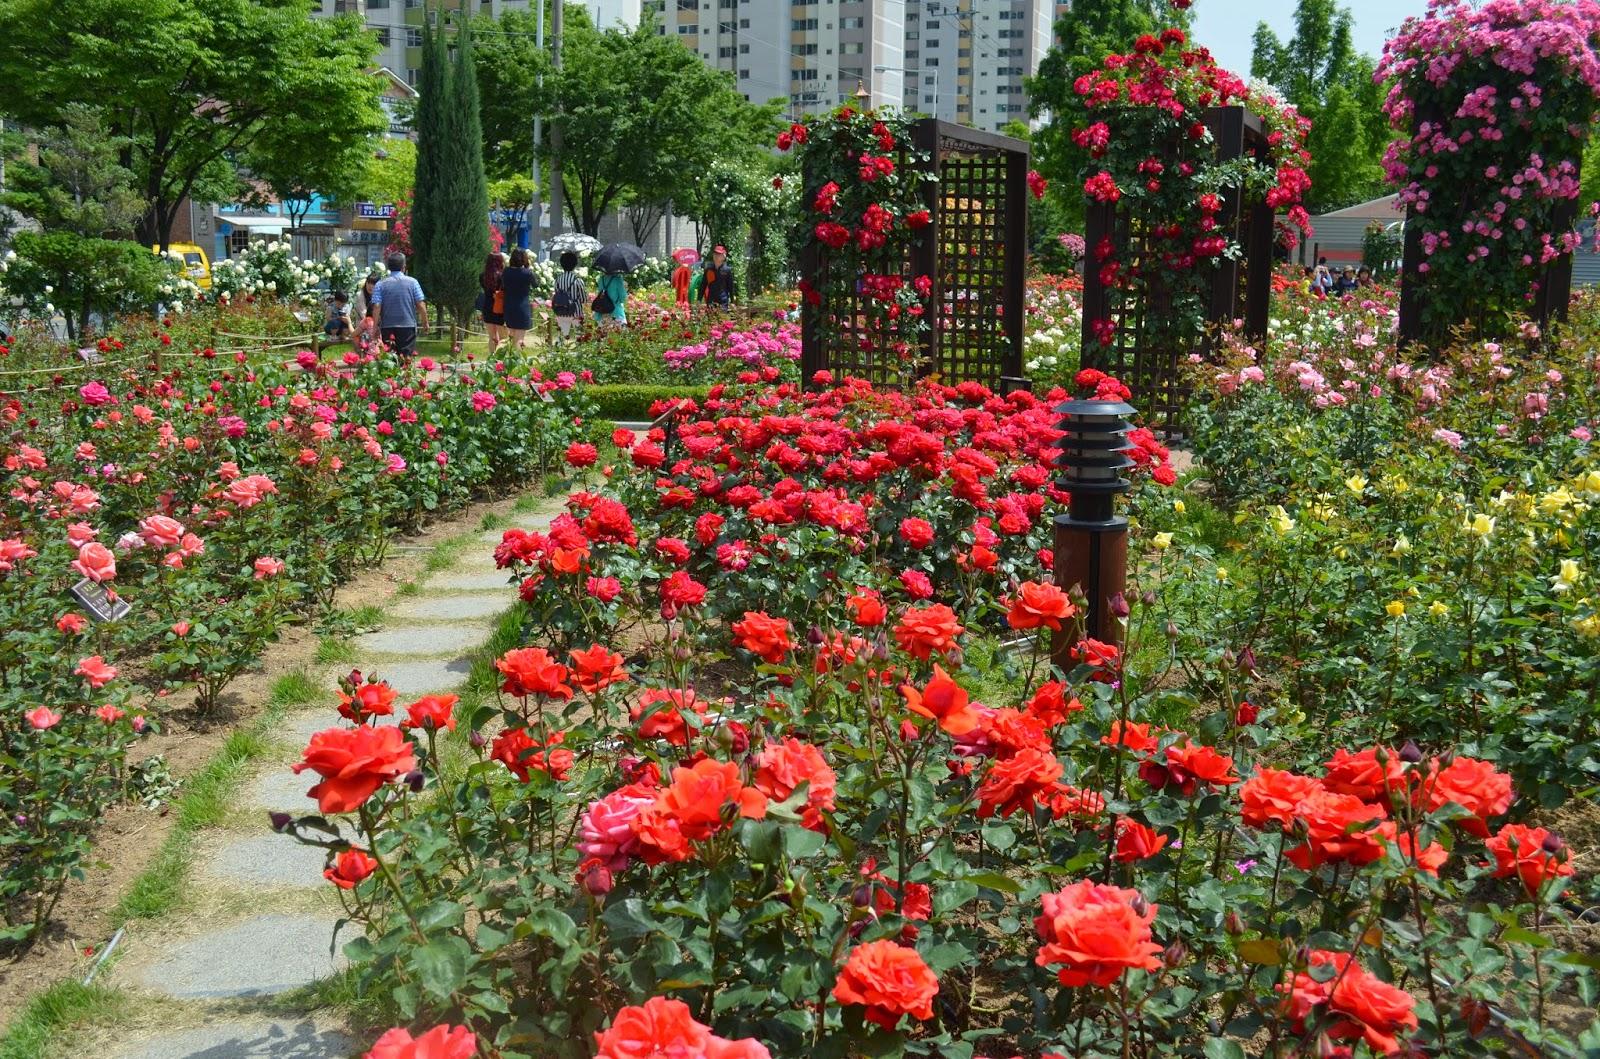 Fun Flower Garden : Fun free daegu travel flower festival